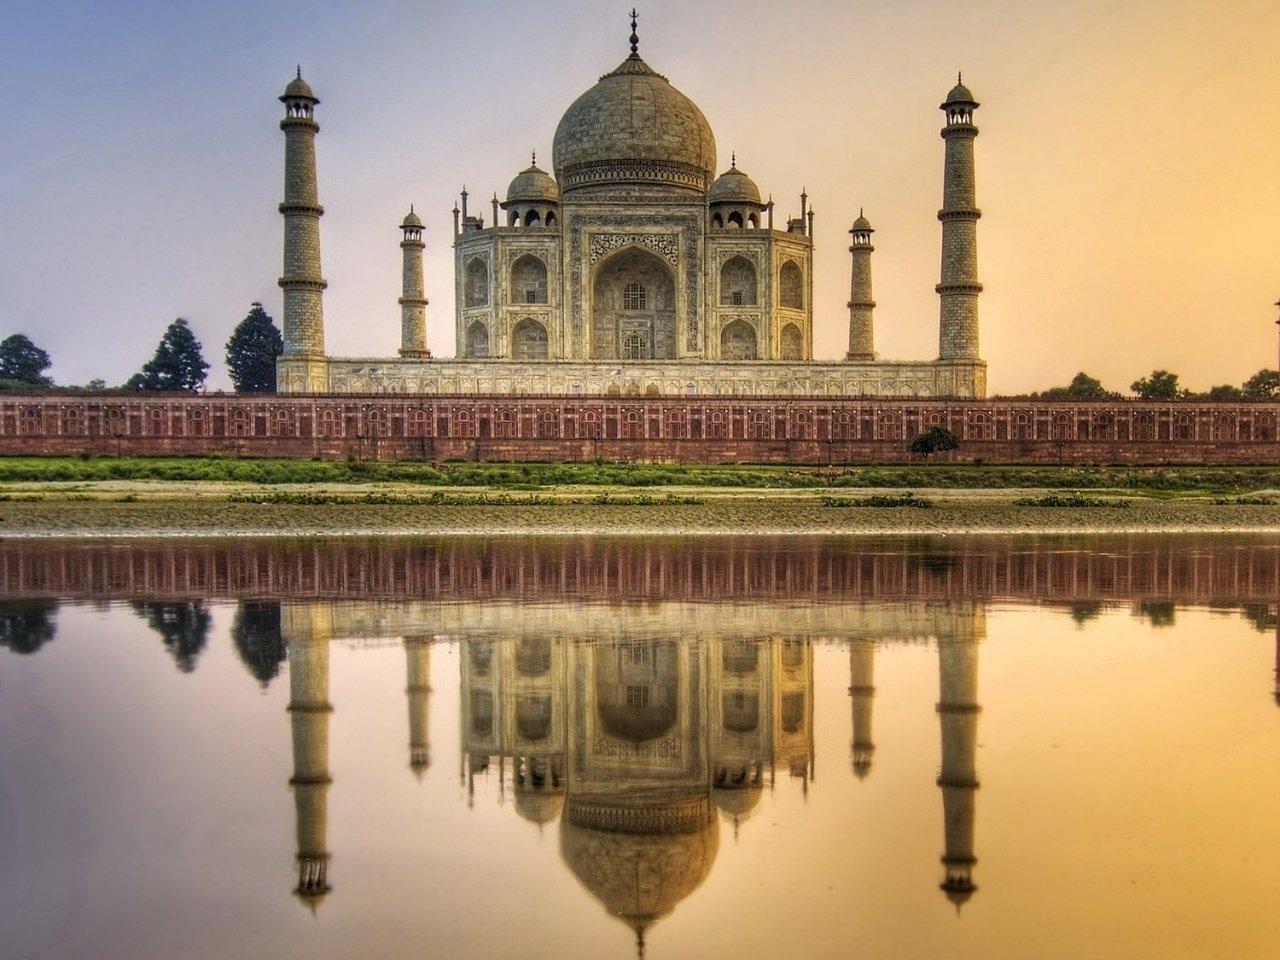 23885 скачать обои Пейзаж, Река, Архитектура, Тадж Махал (Taj Mahal) - заставки и картинки бесплатно